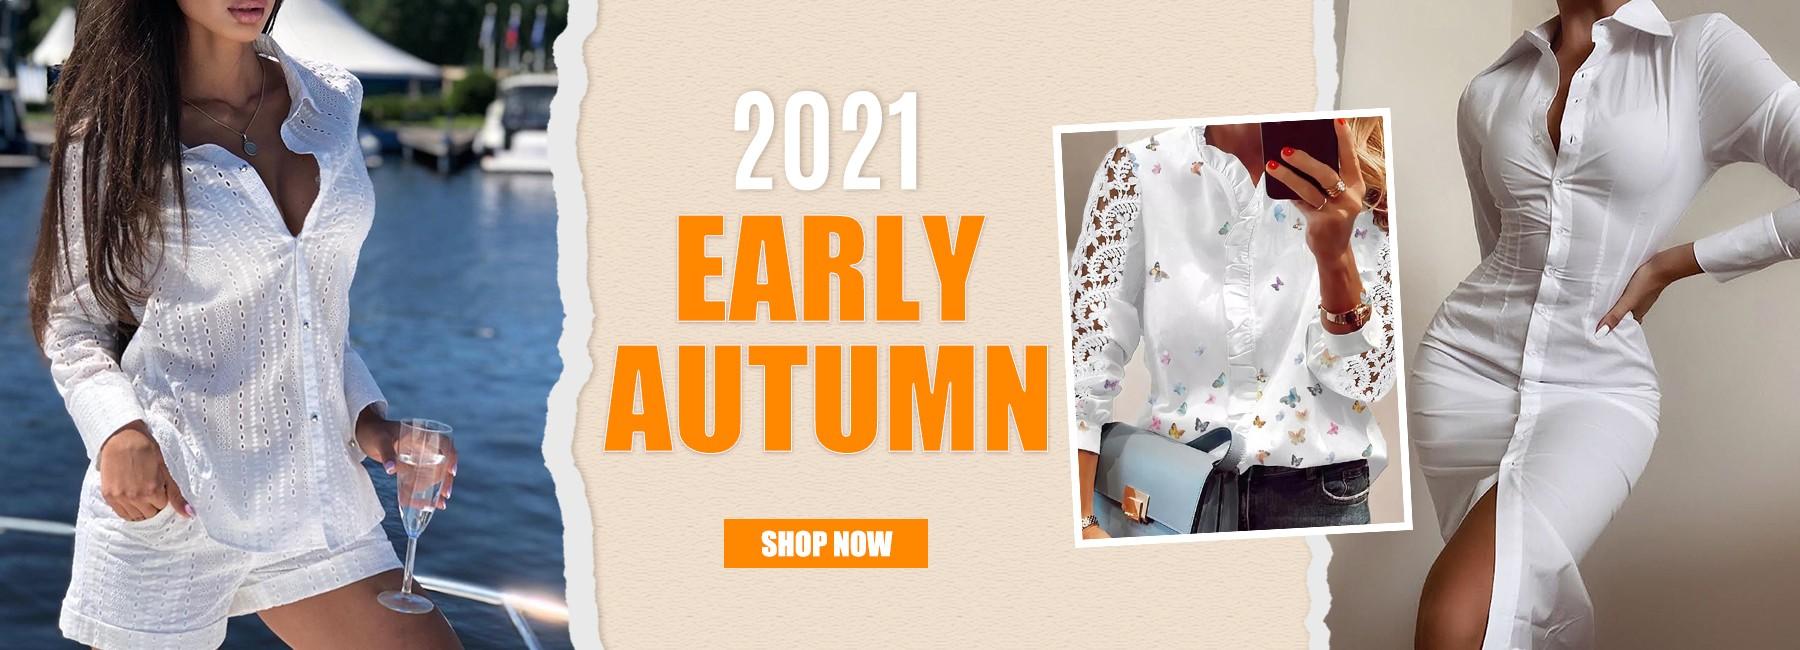 Early Autumn 2021